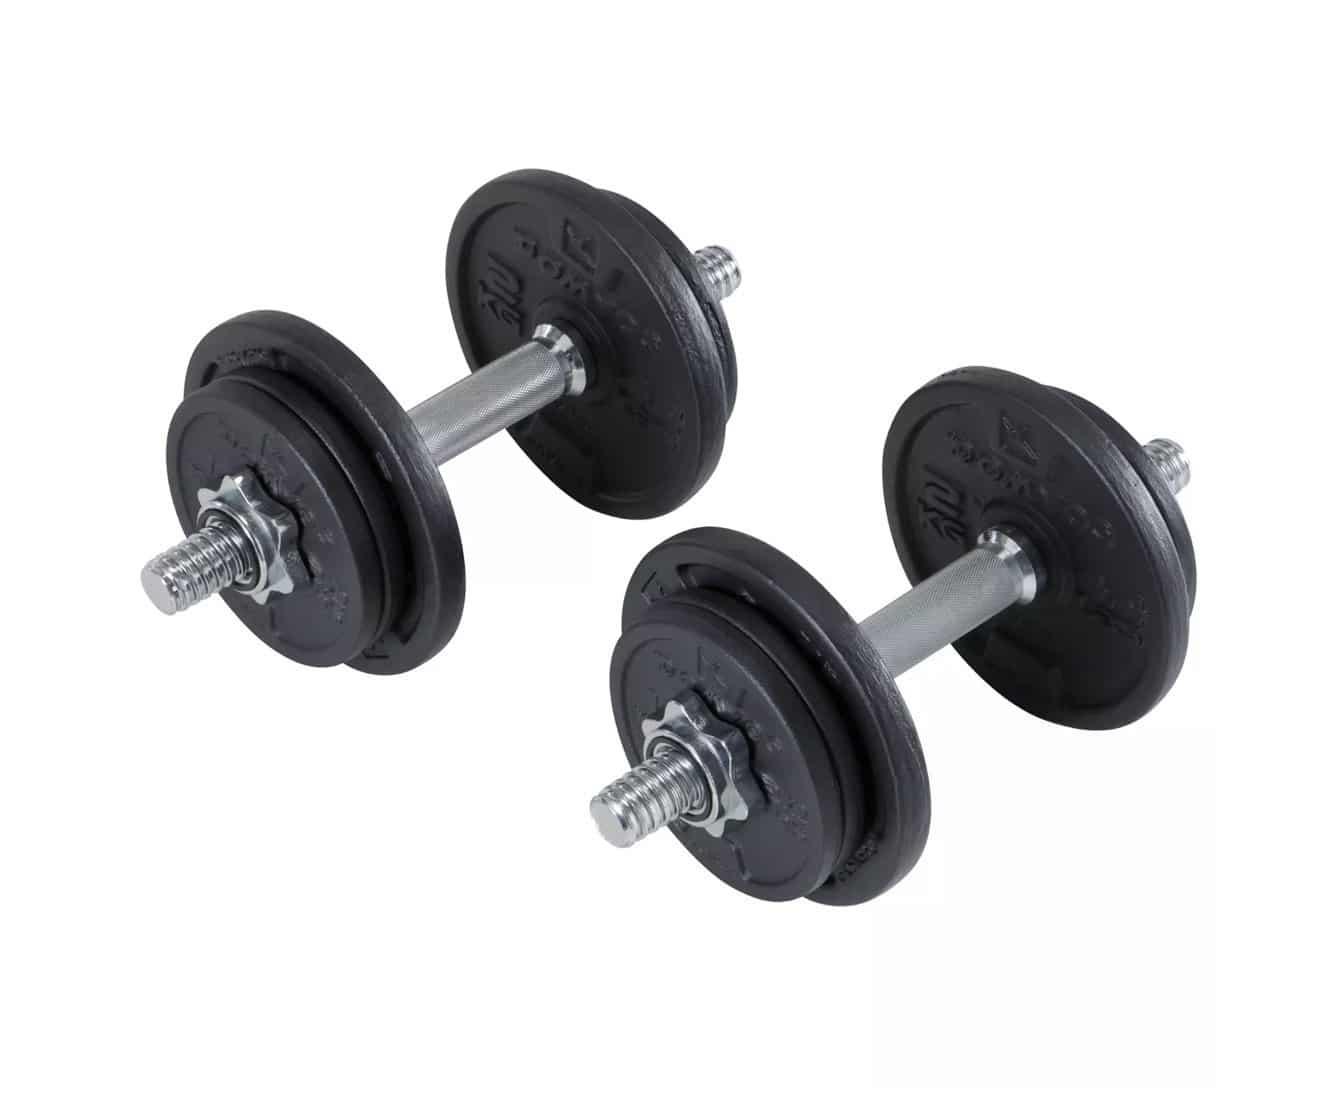 dumbbells for home gym